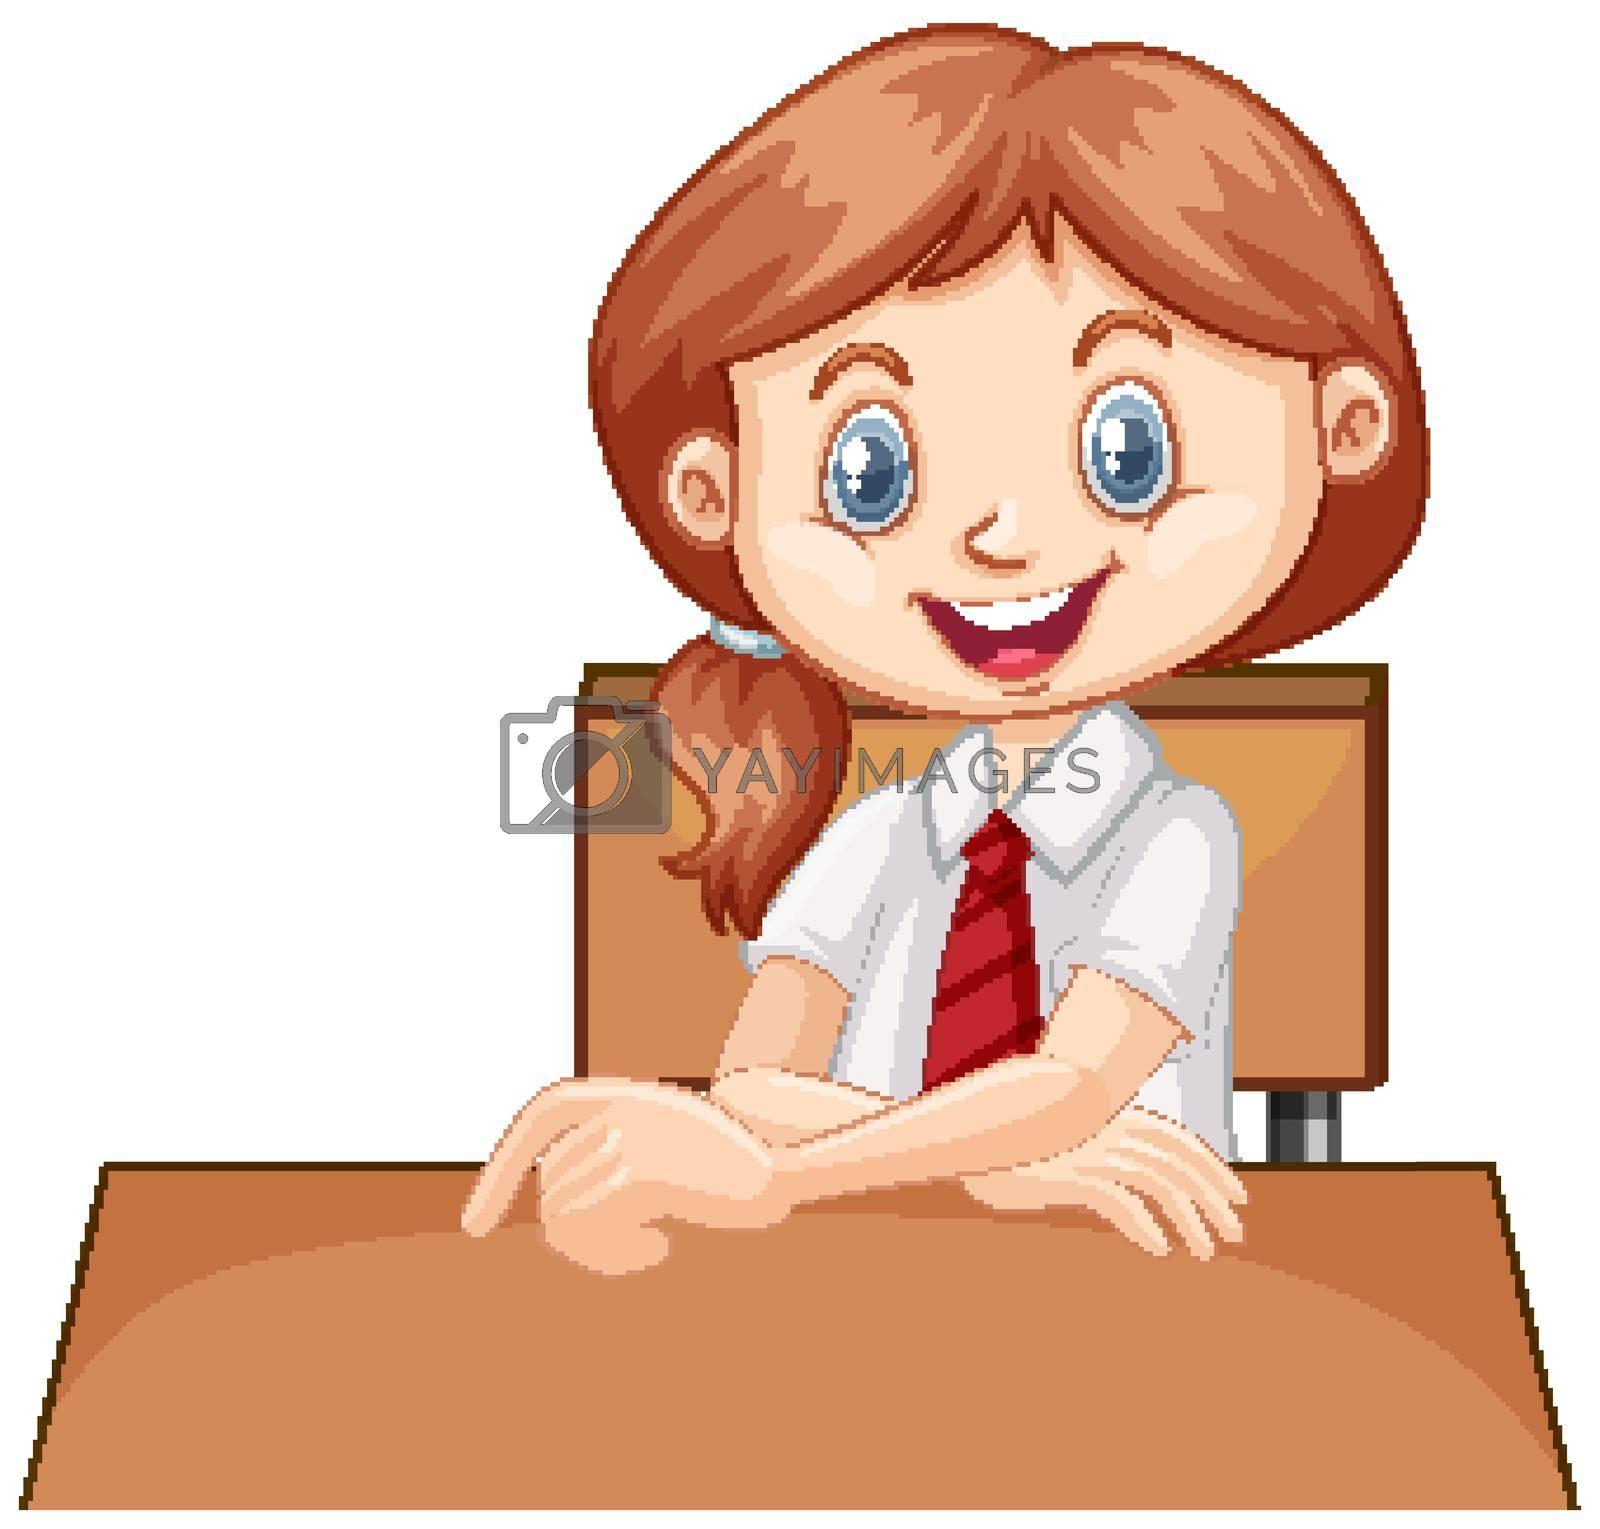 One happy girl sitting on the desk illustration